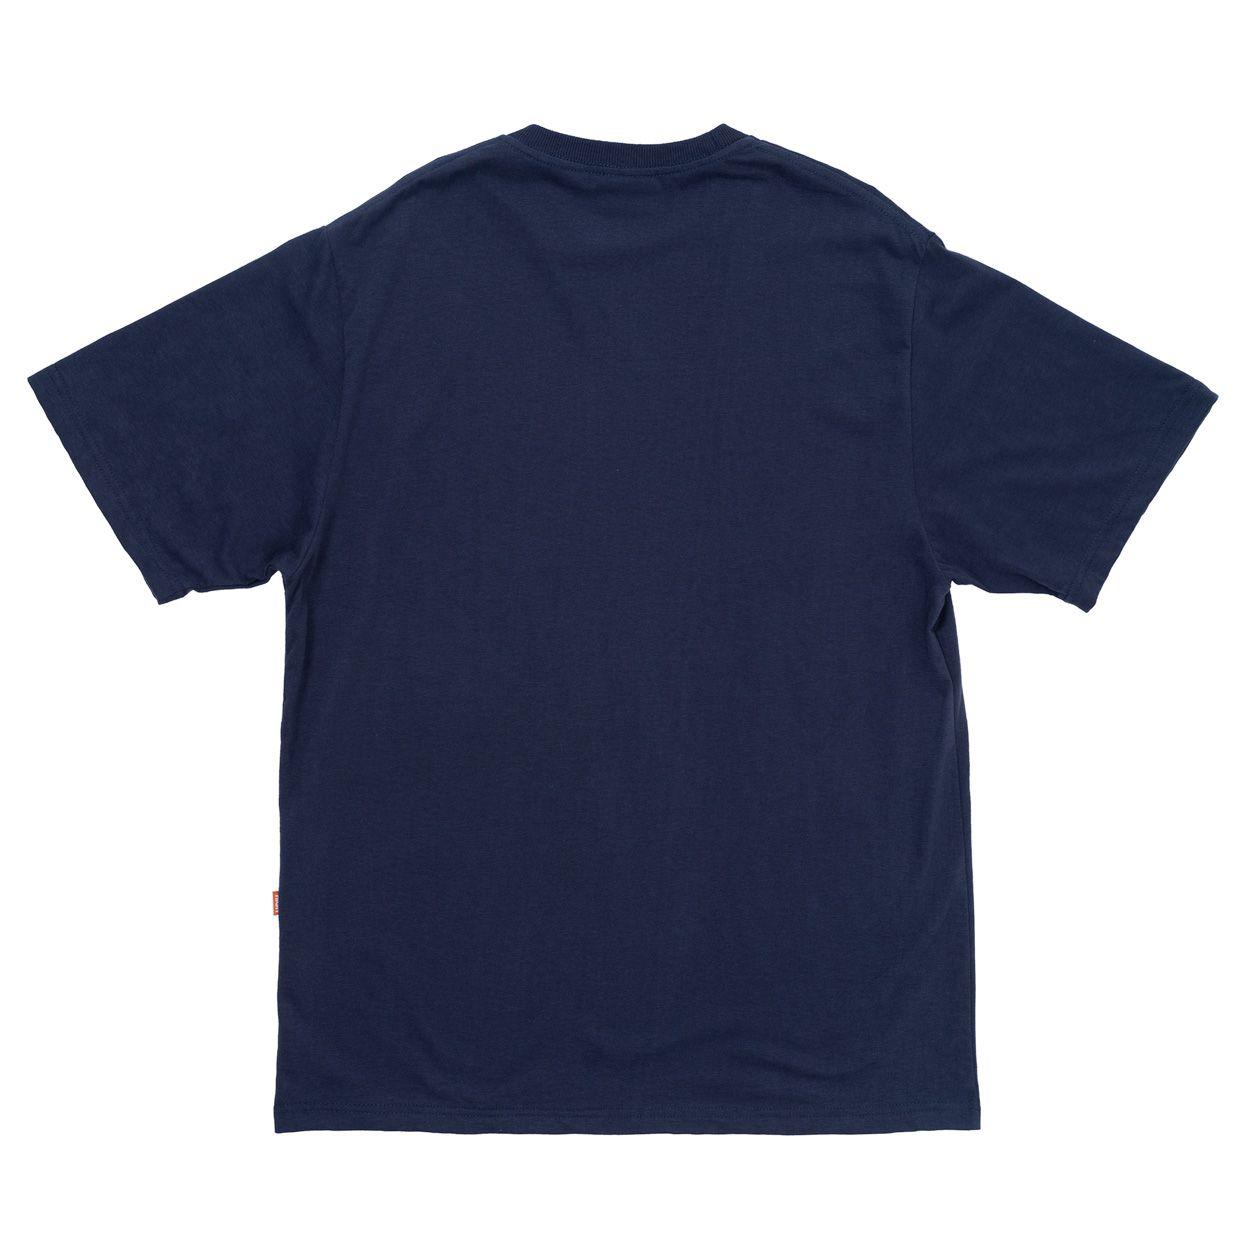 Camiseta High Tee Entertainment Navy